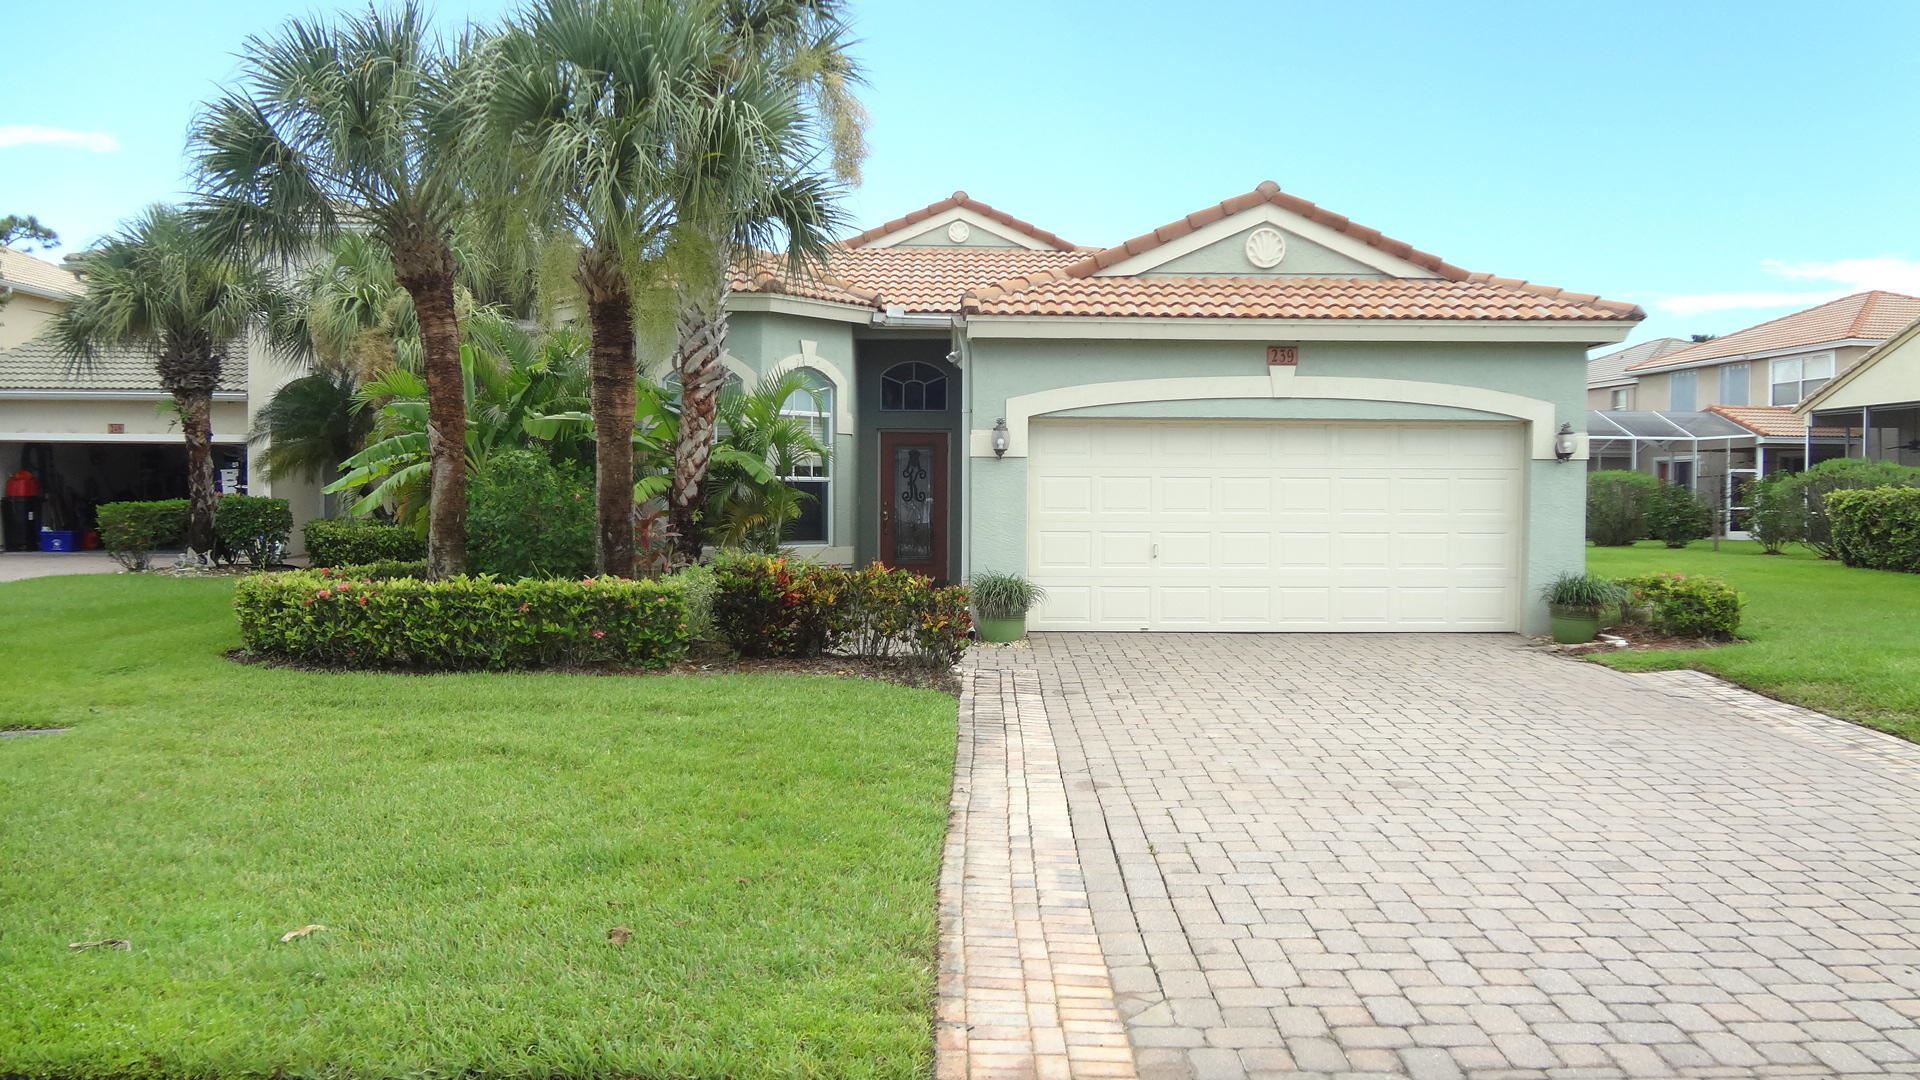 239 NW Red Cedar Street, Jensen Beach, FL 34957 - #: RX-10644858